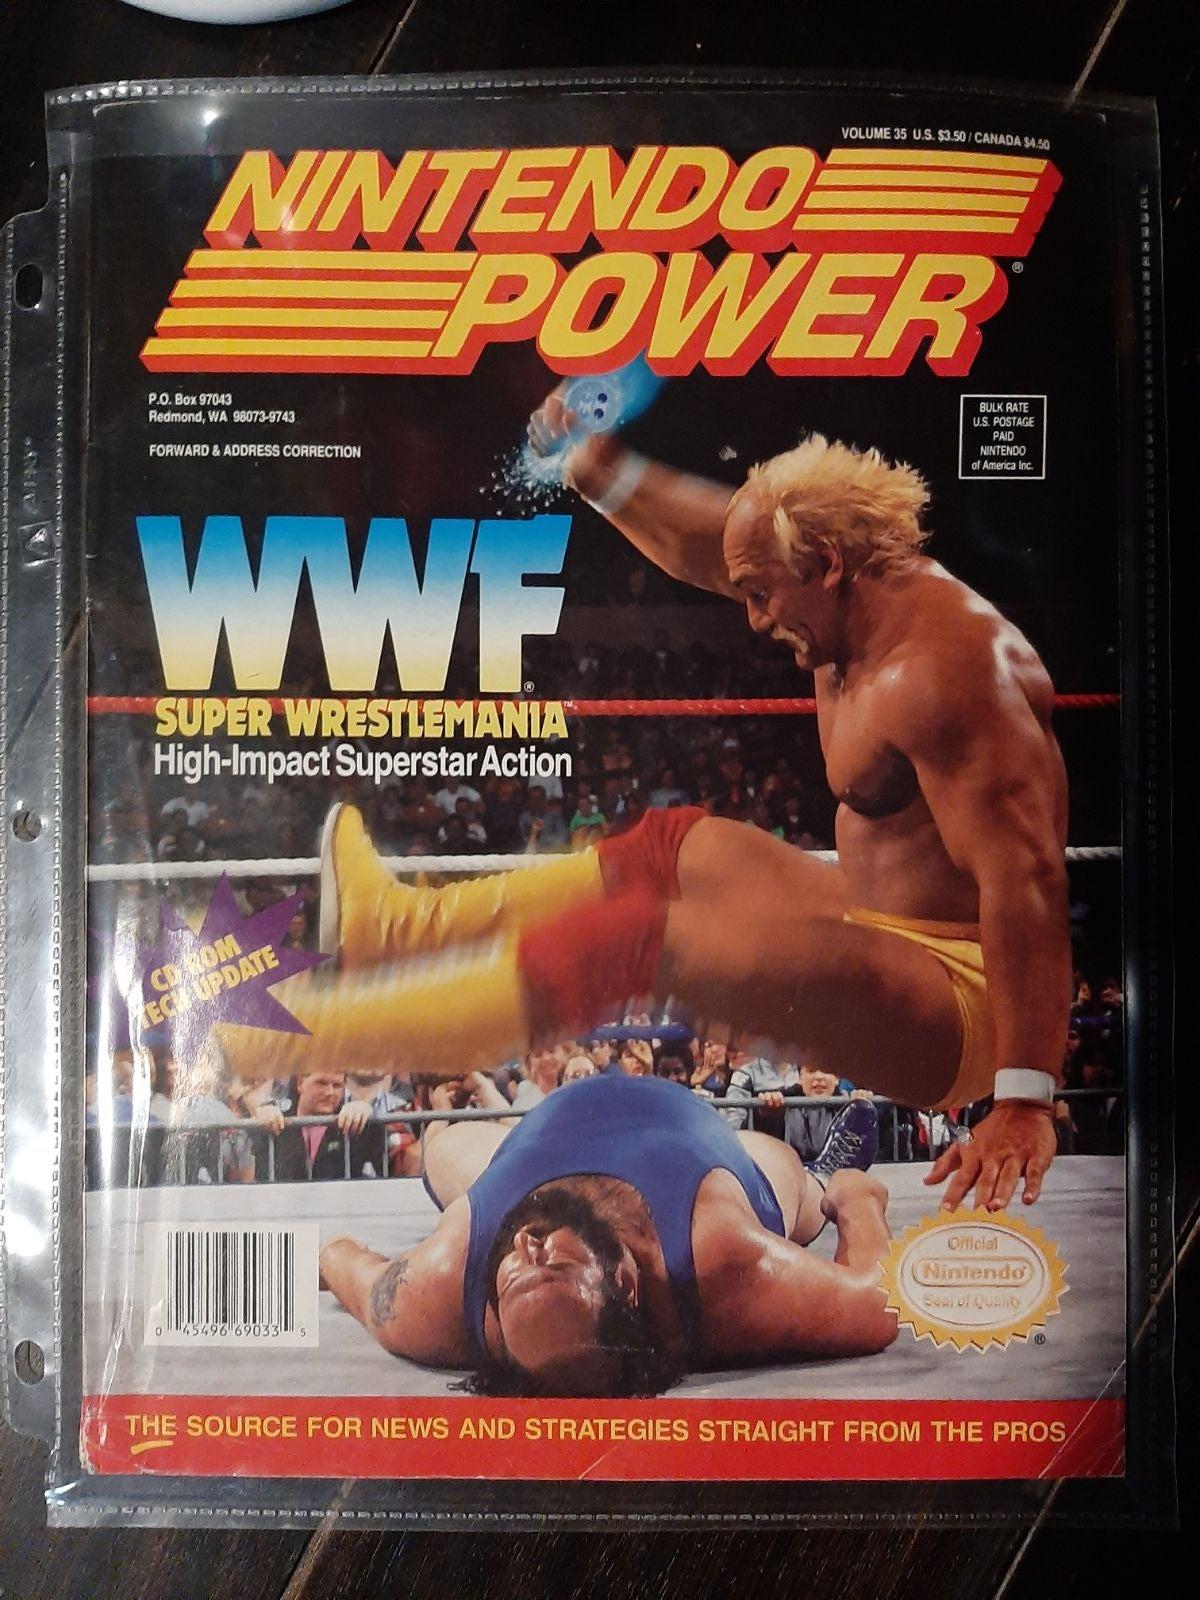 Vintage Nintendo Power magazine volume 3